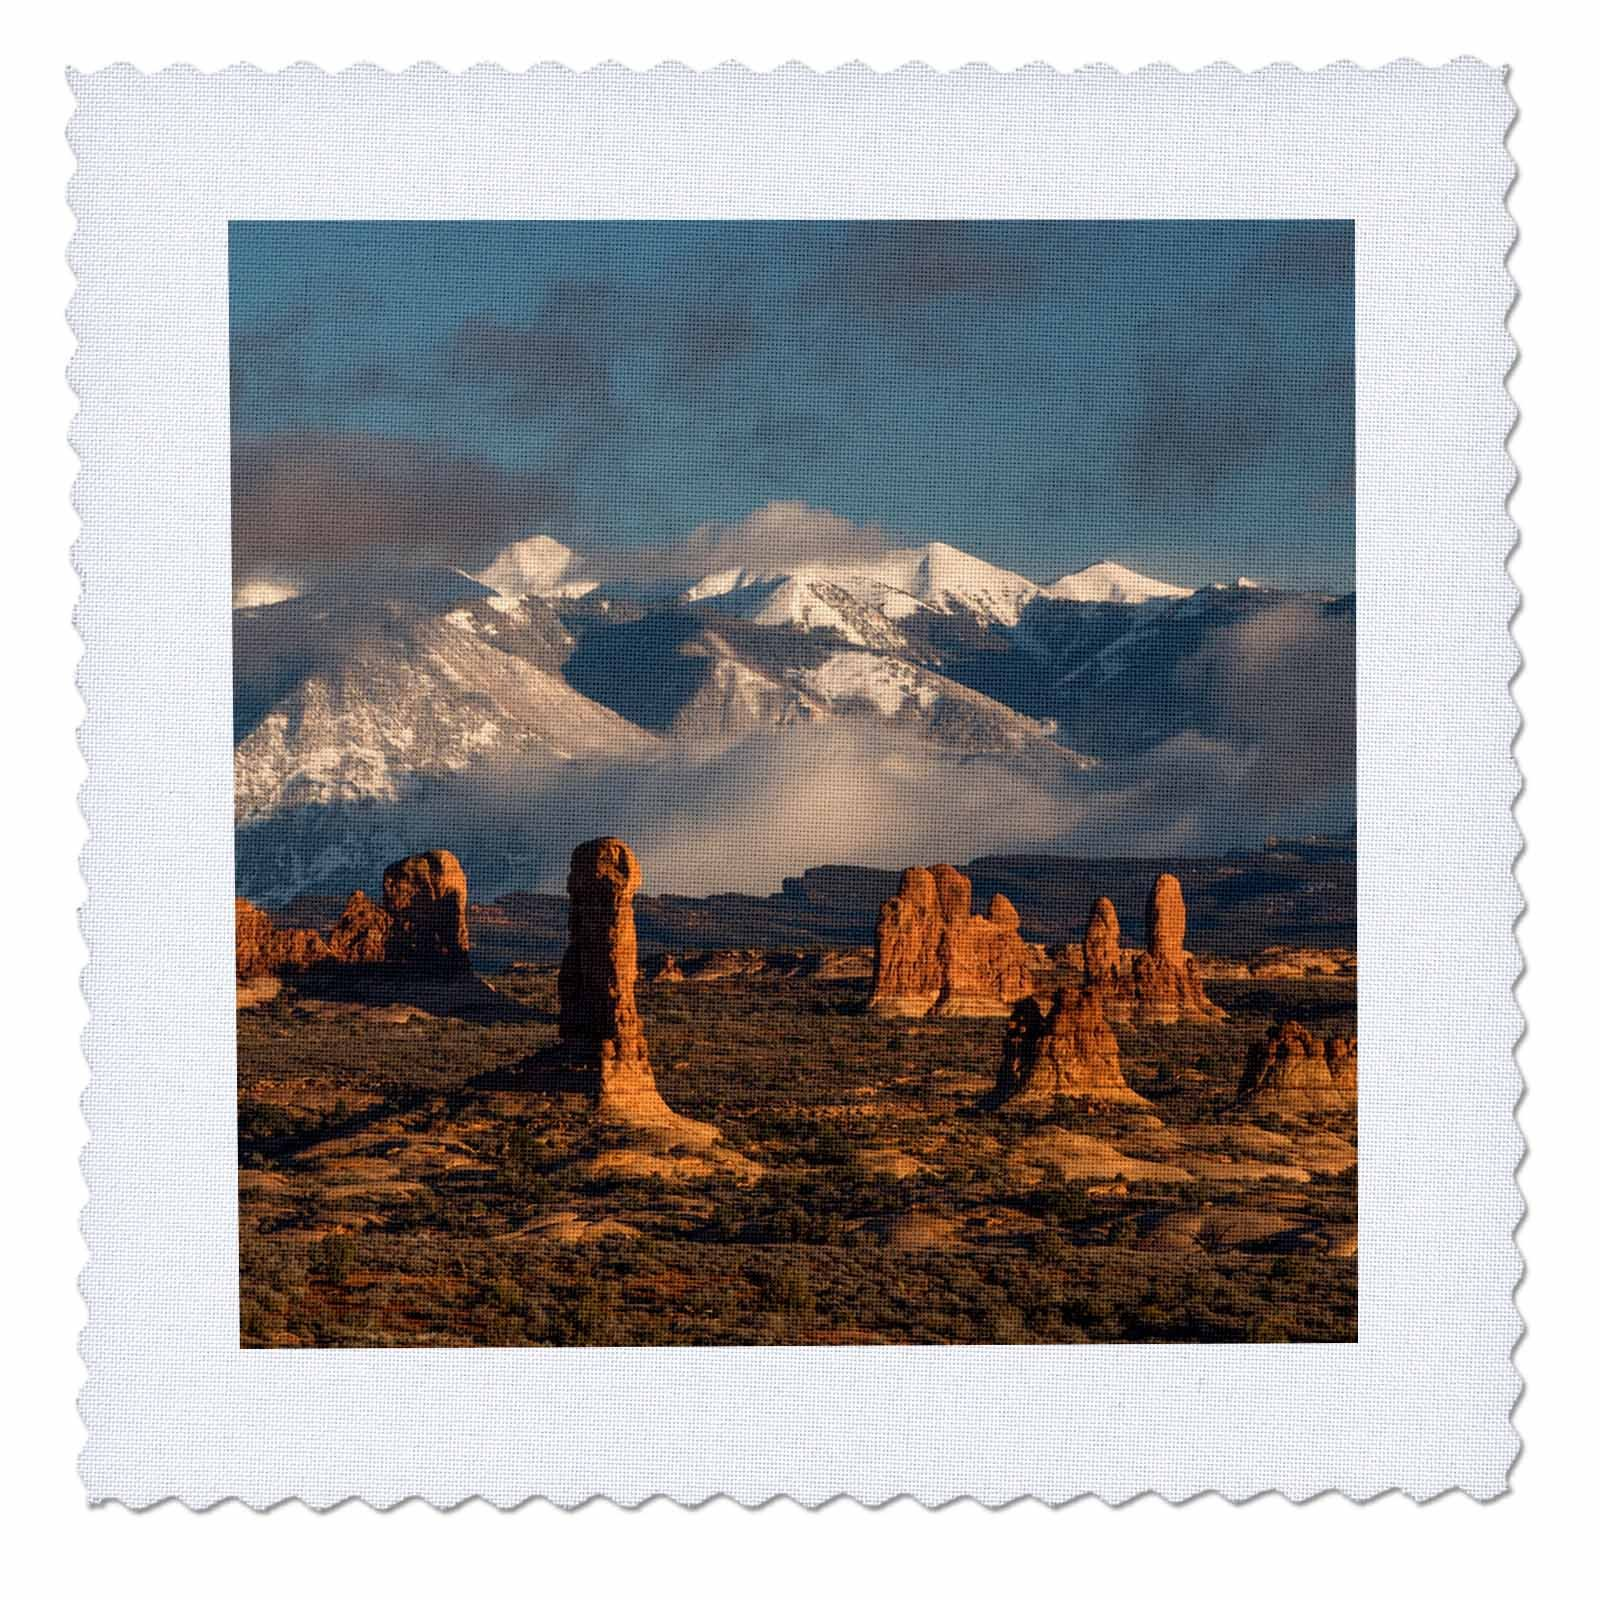 3dRose Danita Delimont - Utah - Usa, Utah, Arches NP. Windows Section with La Sal Mountain range. - 16x16 inch quilt square (qs_260265_6)